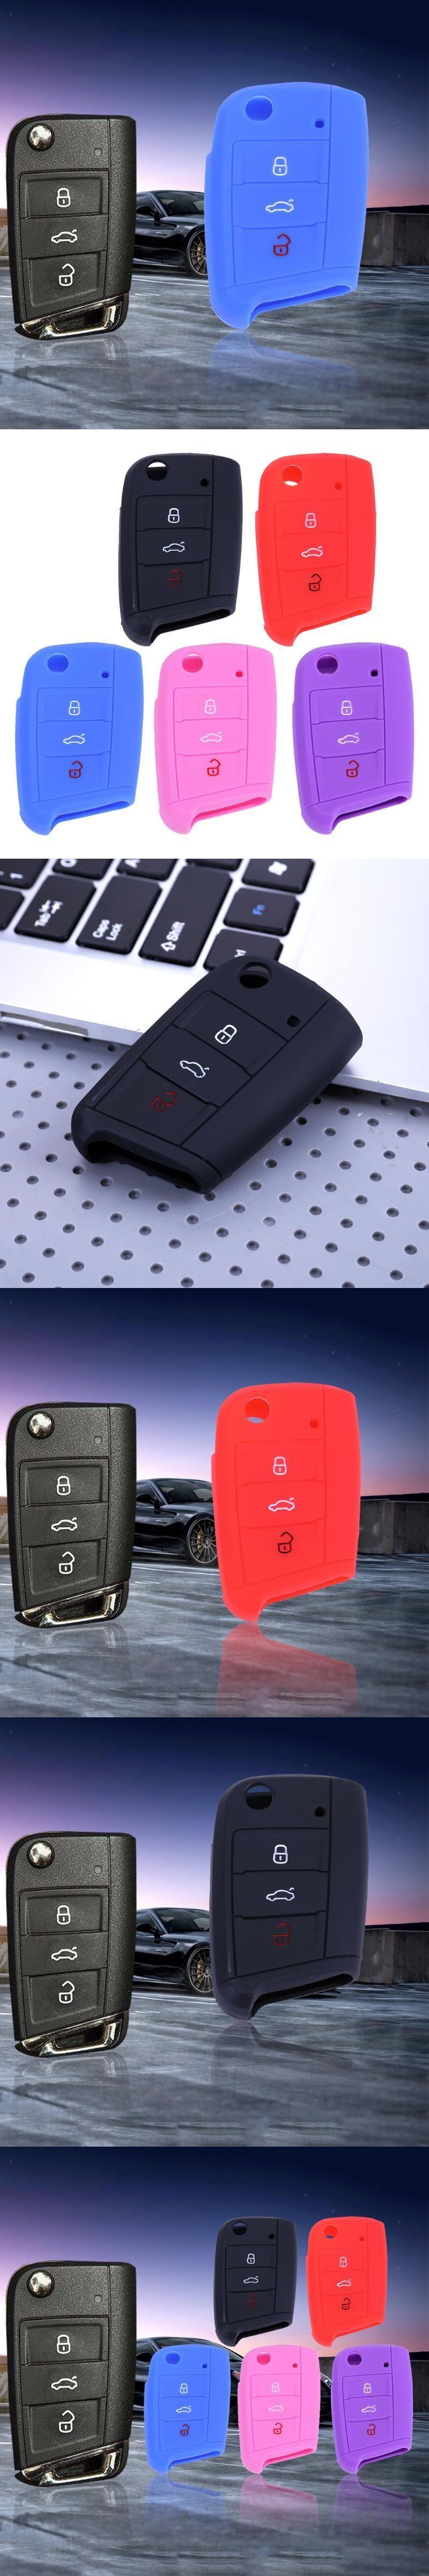 Car dashboard accessories toys  Car Accessories Silicone  Button Remote Flip Key Case Fob Protect